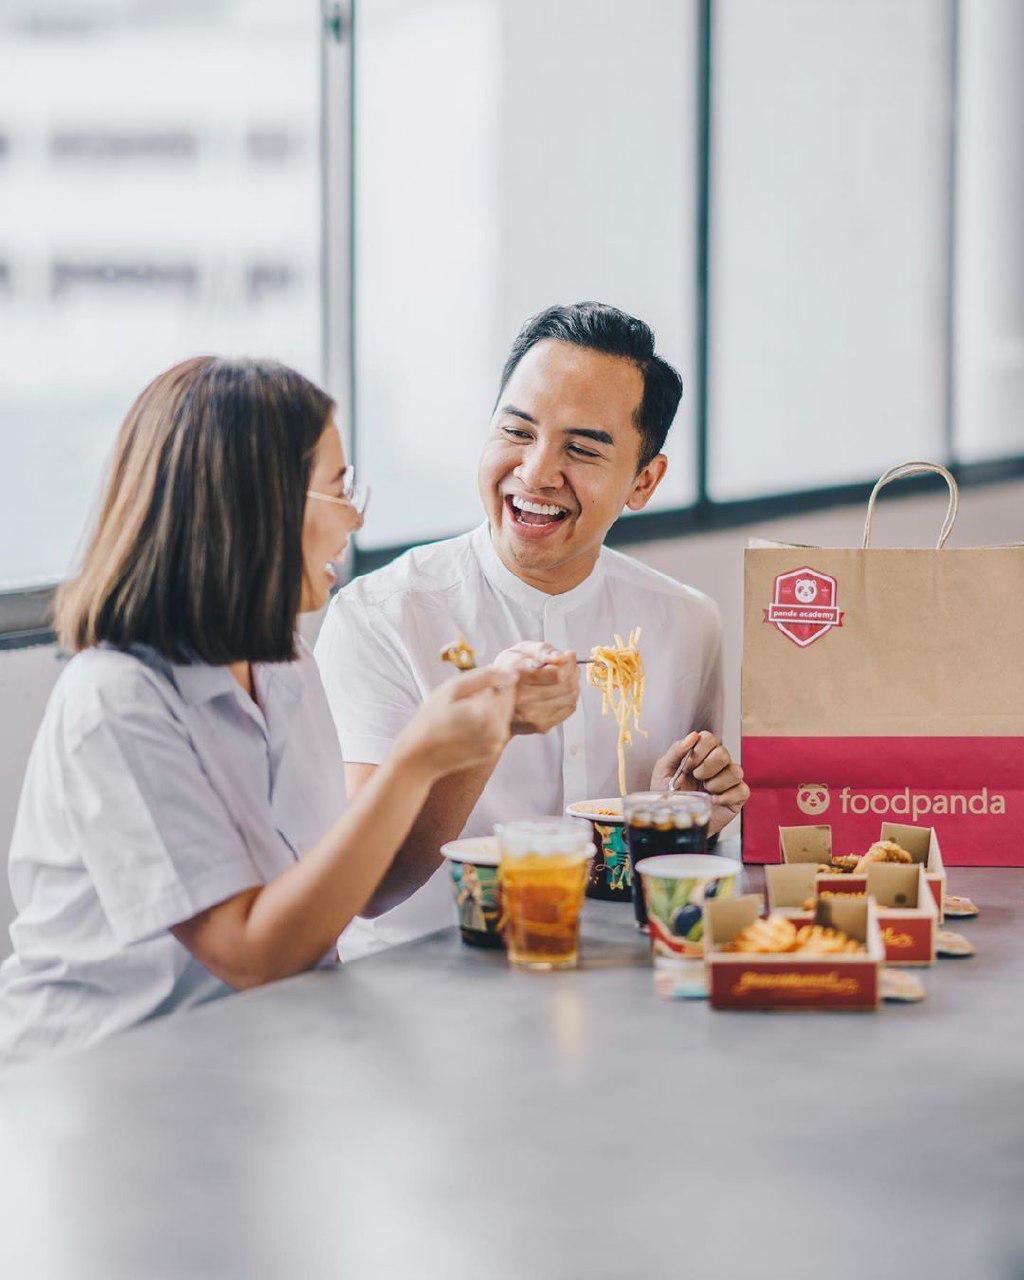 foodpanda promo 2019